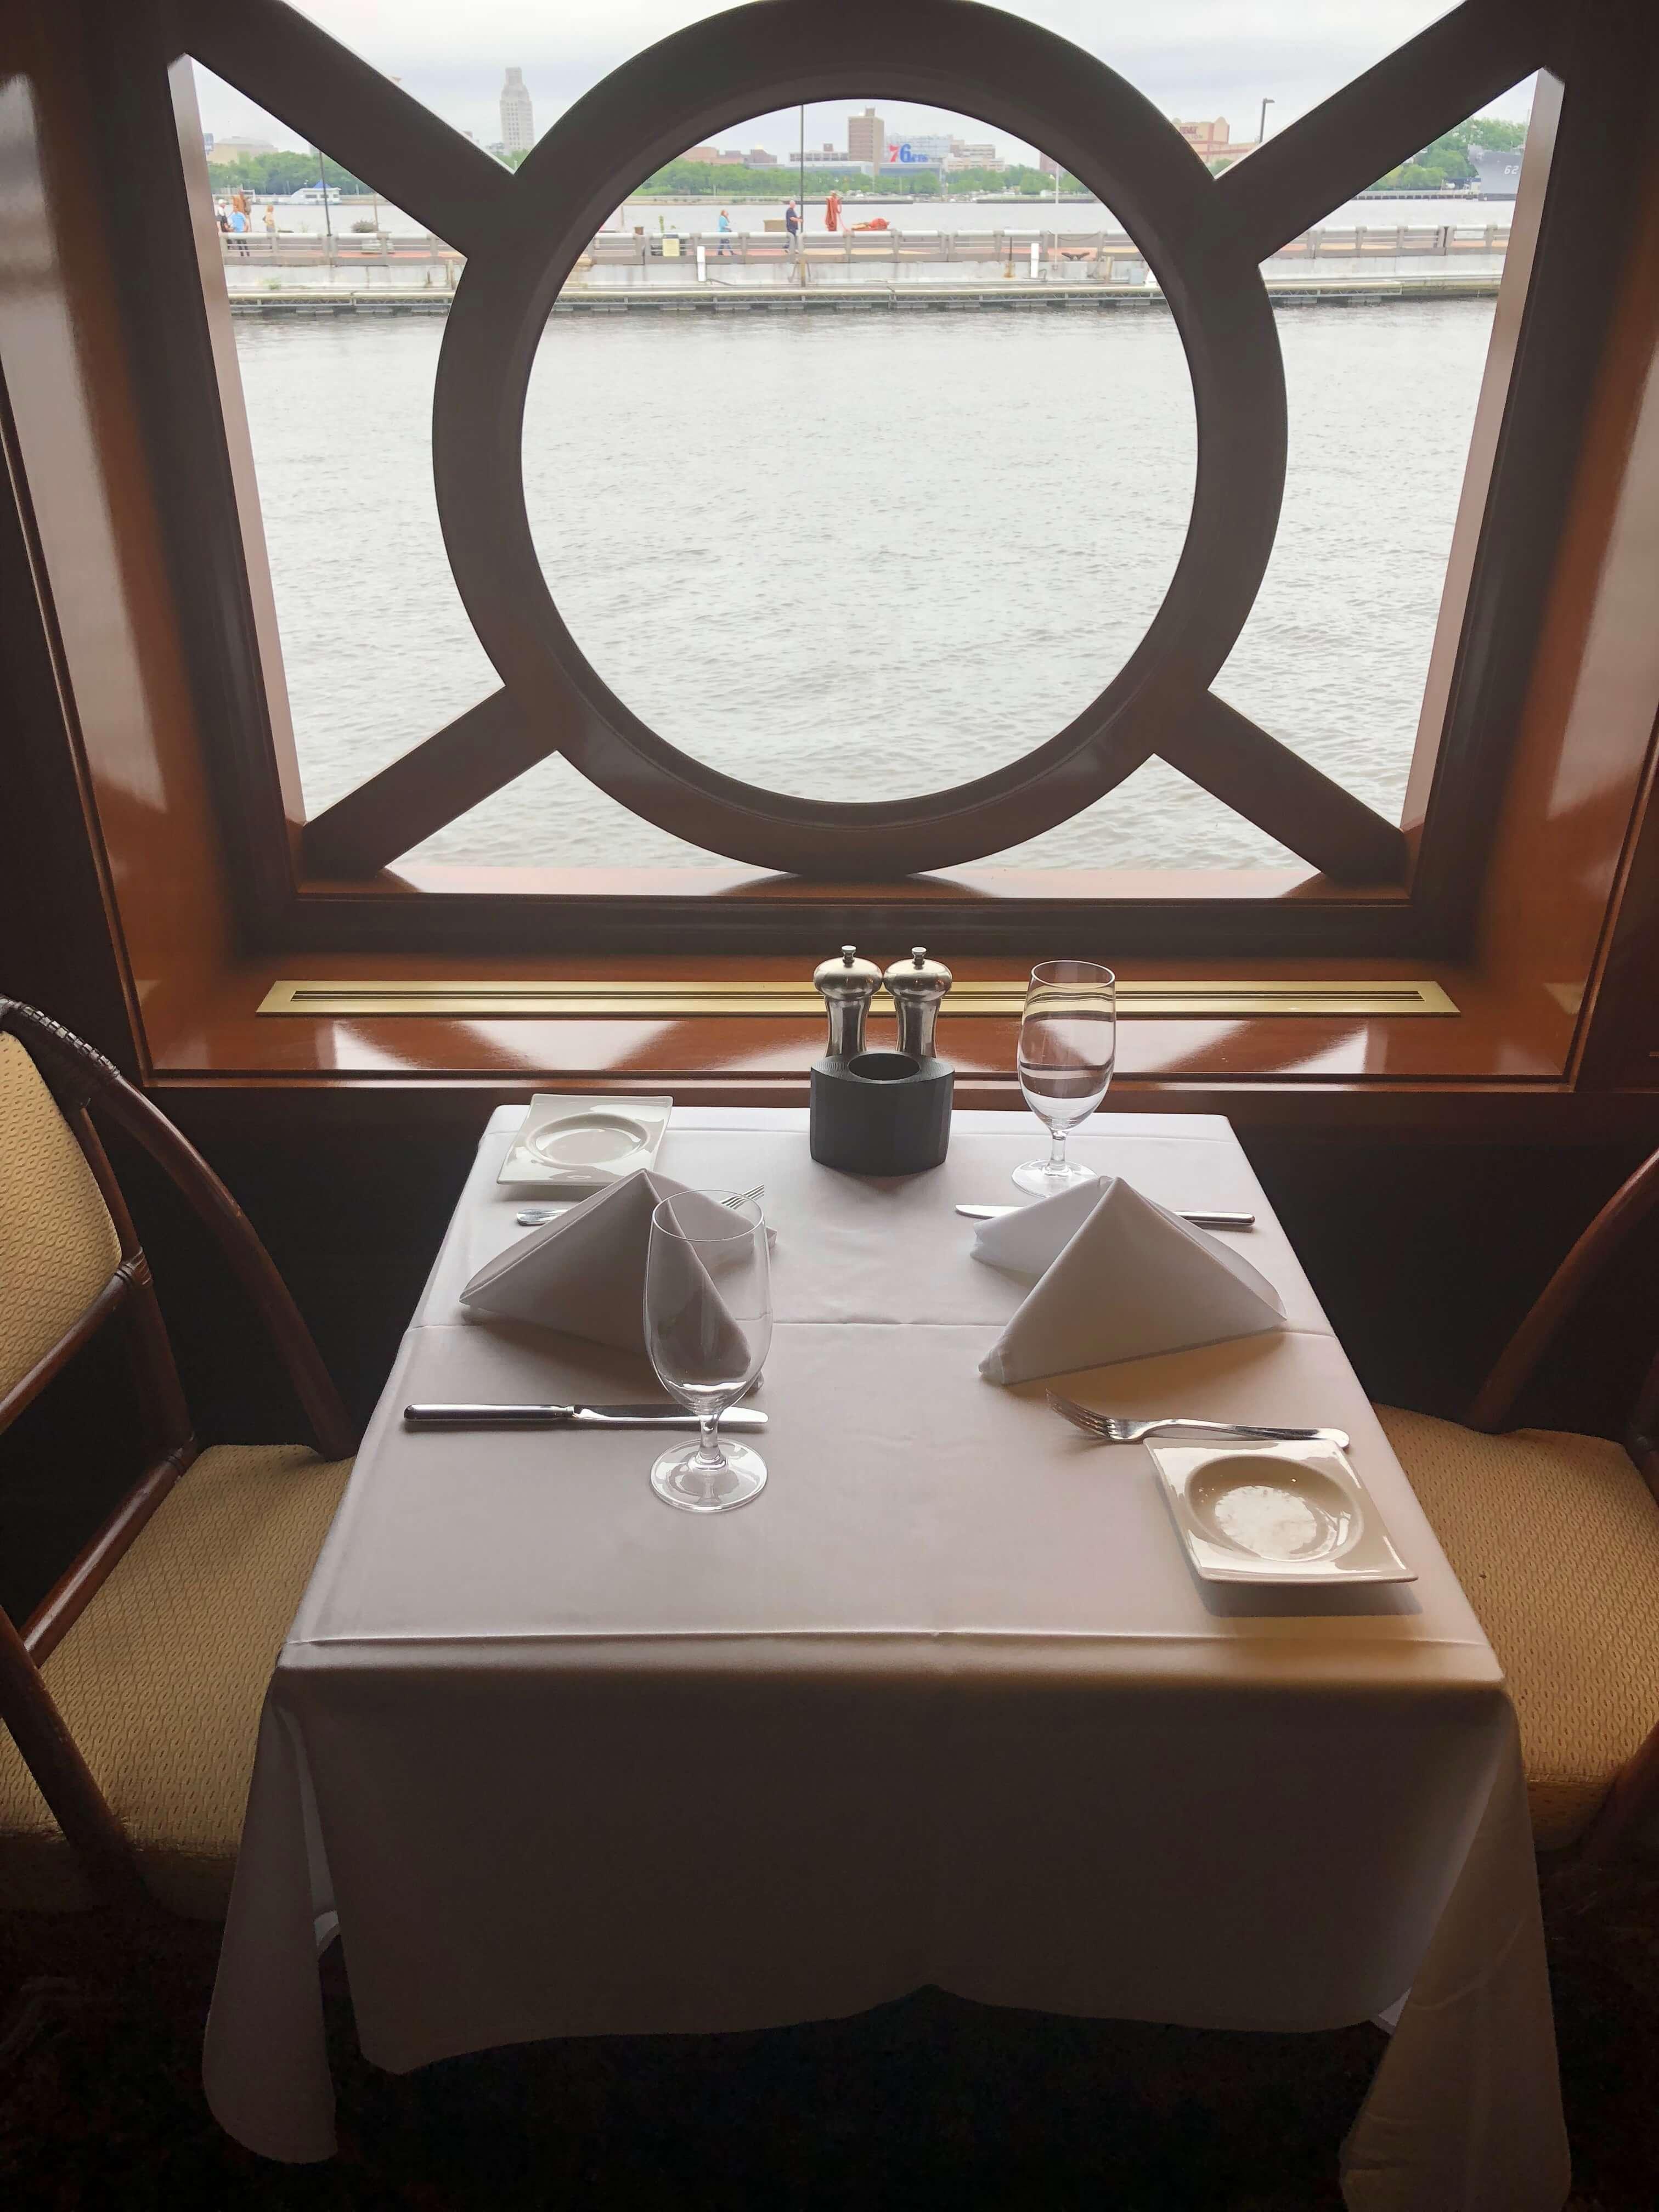 Moshulu Restaurant brunch on a boat